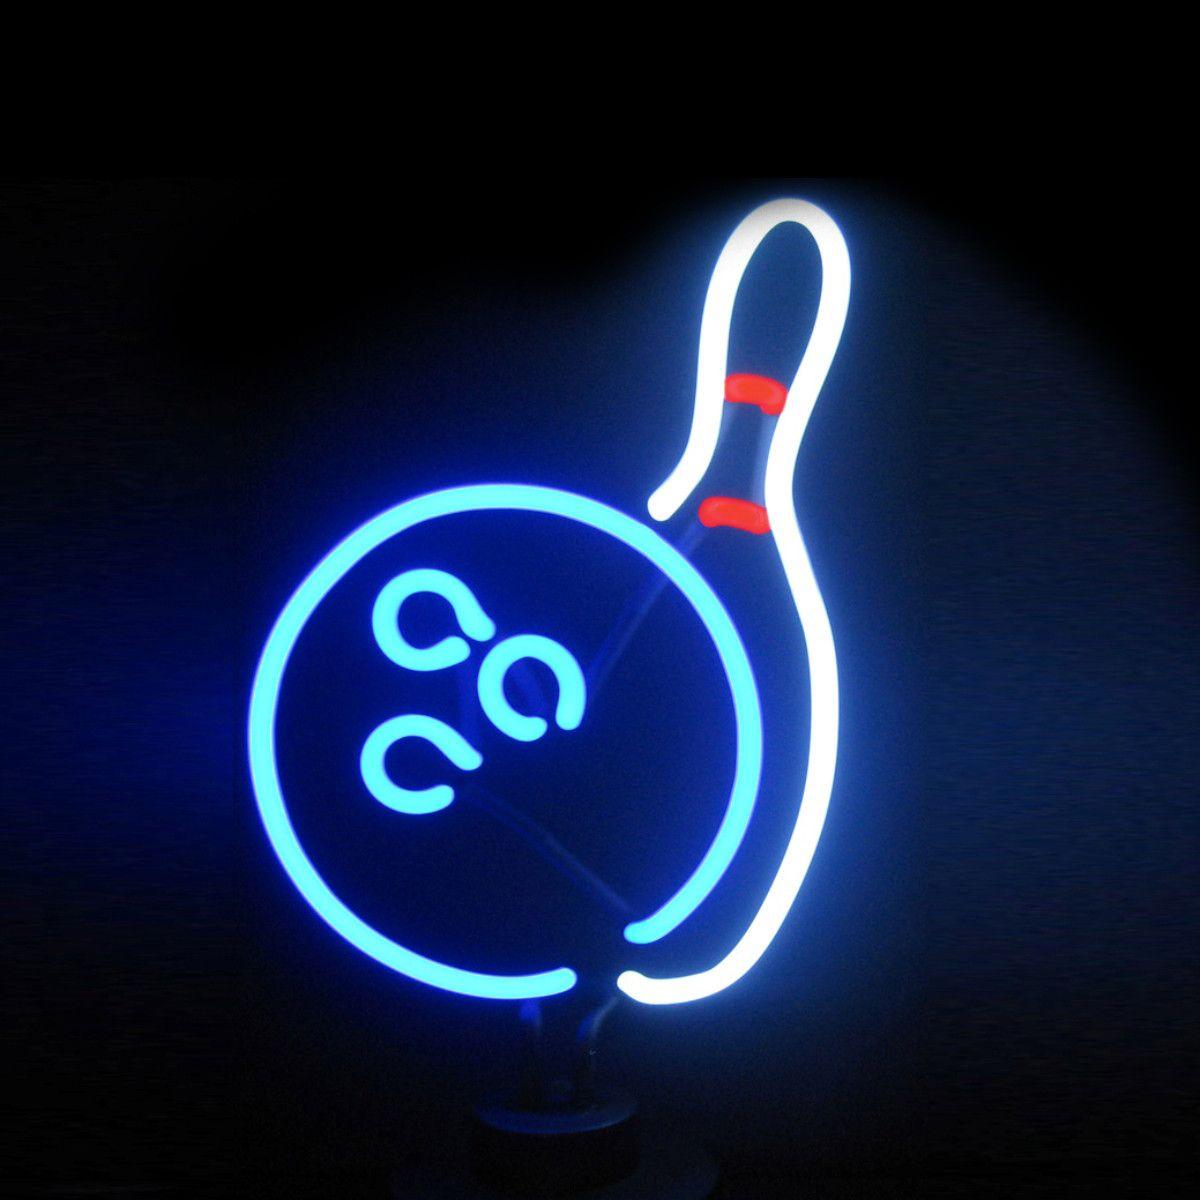 Bowling Neon Sculpture Neon Lighting Neon Signs Neon